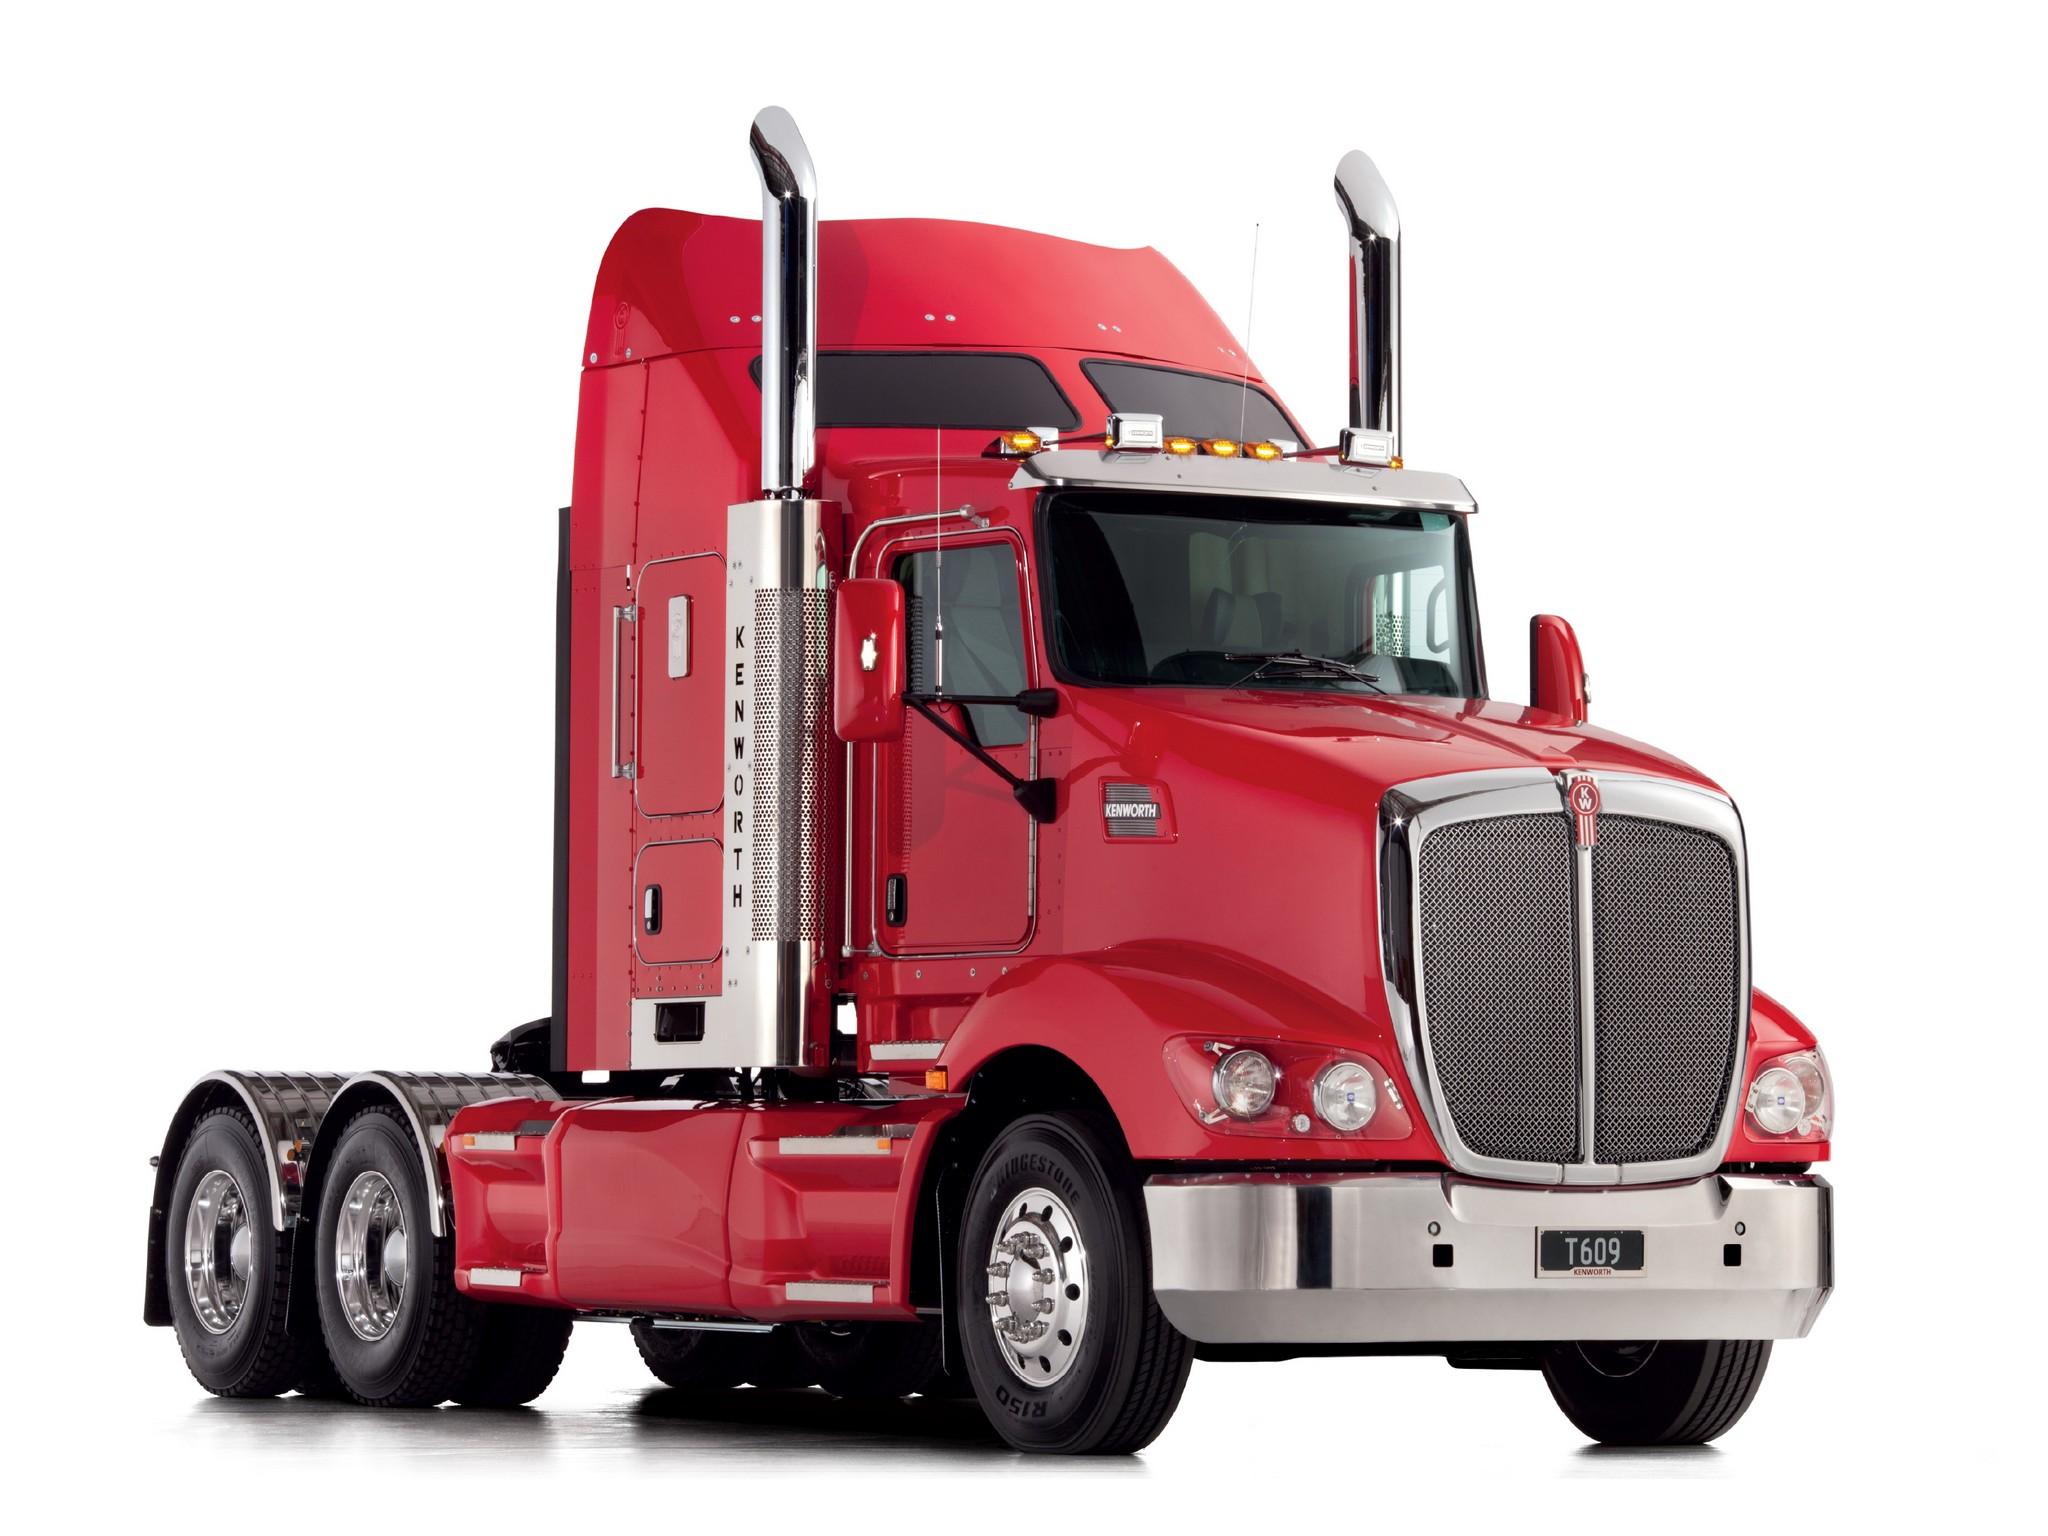 2011 kenworth t609 semi tractor r wallpaper 2048x1536. Black Bedroom Furniture Sets. Home Design Ideas